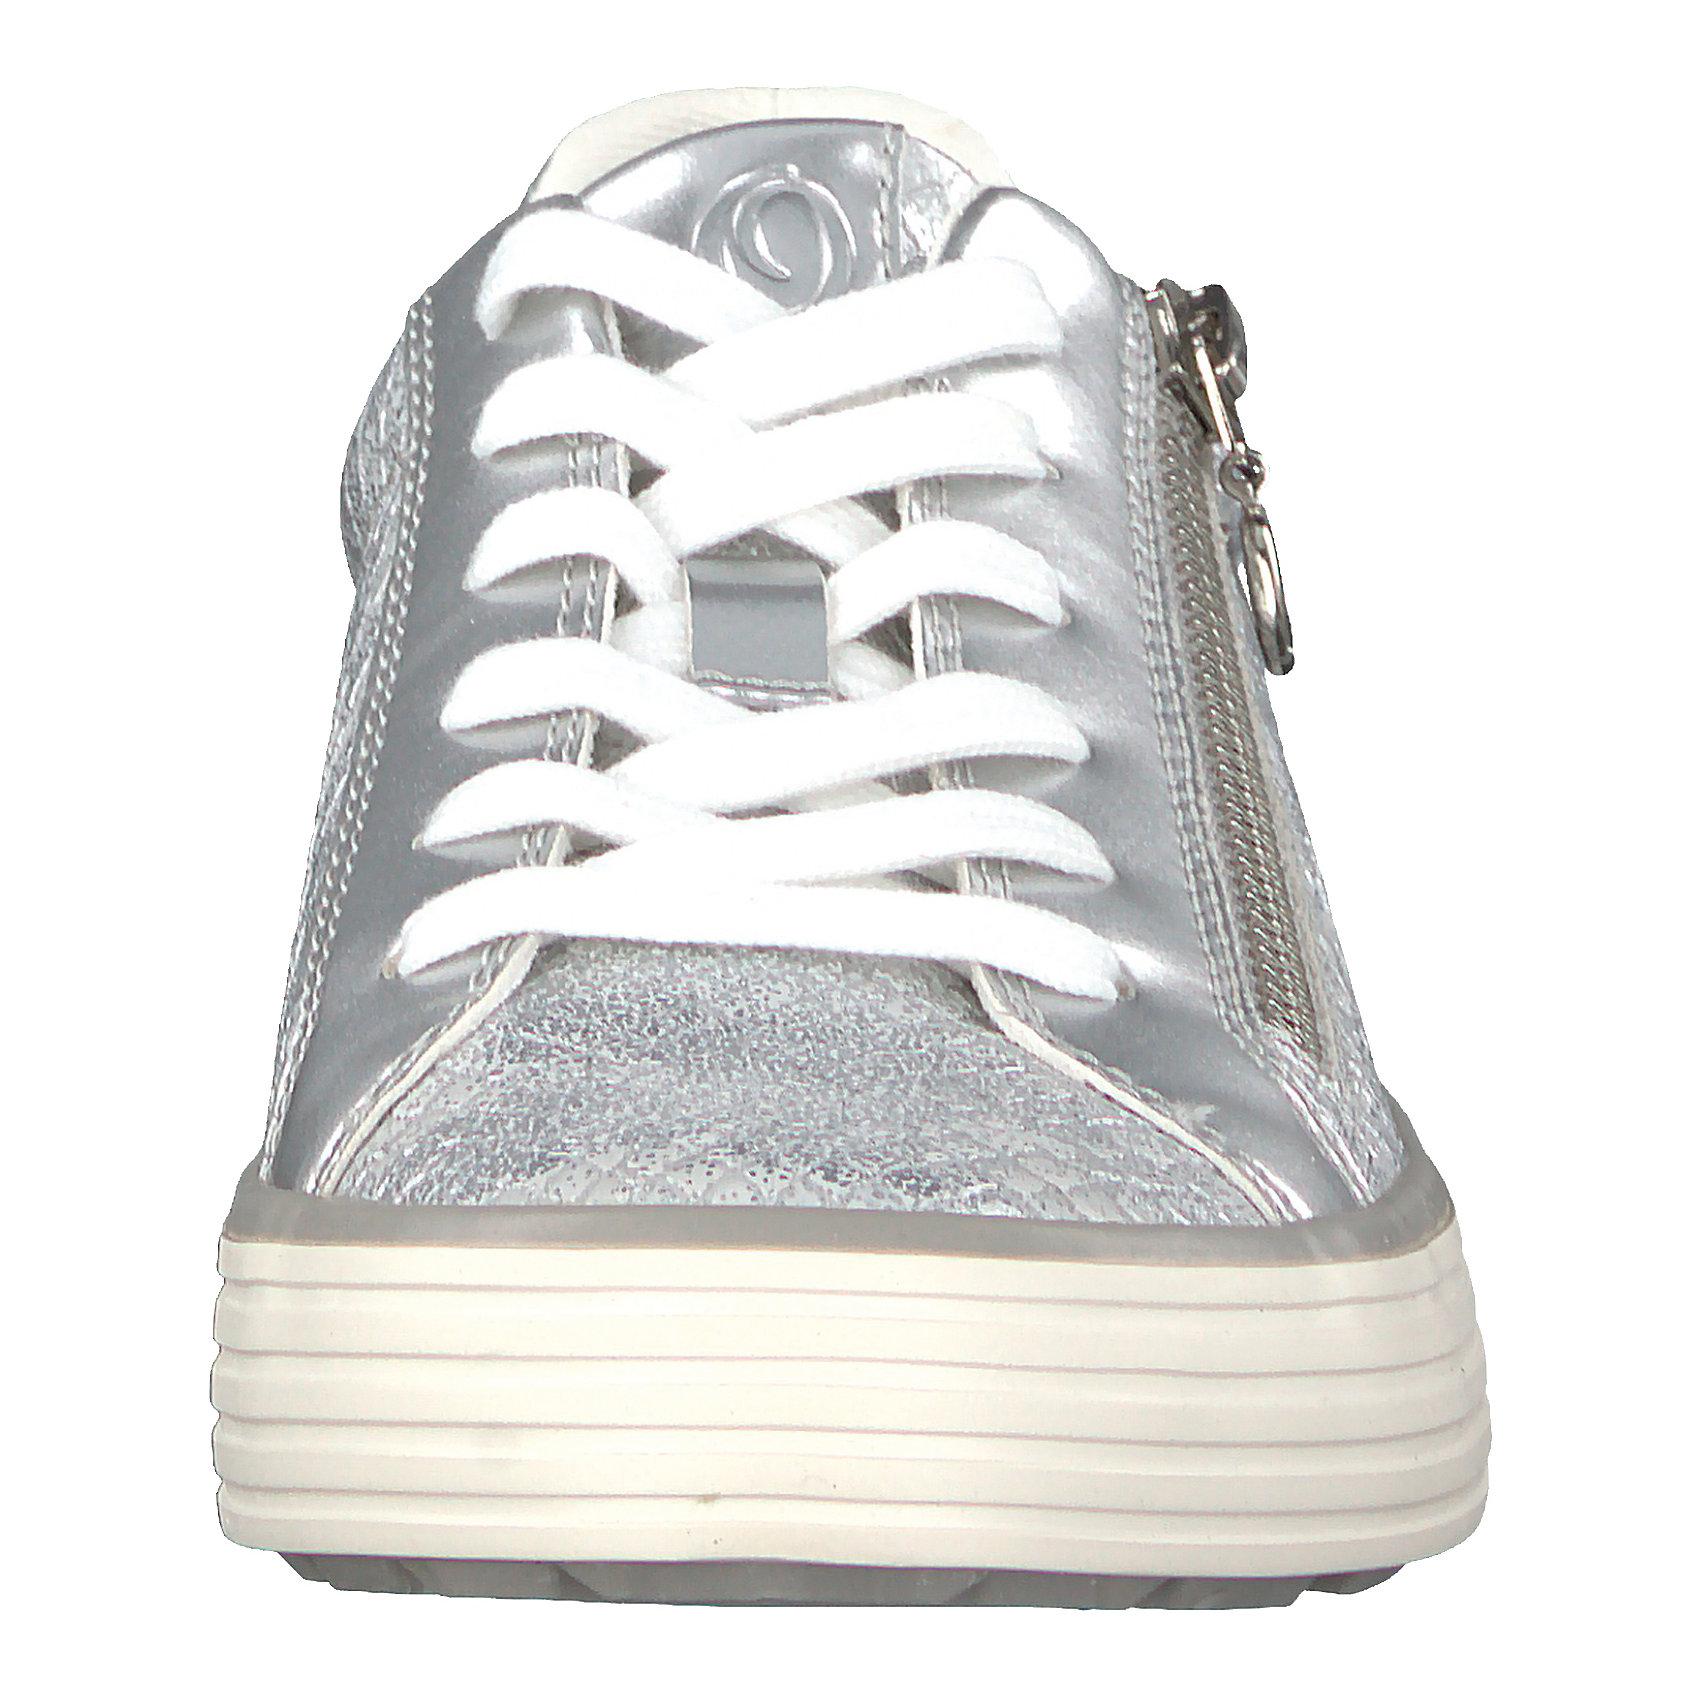 Details zu Neu s.Oliver Sneakers Low silberweiß rosegold 7213953